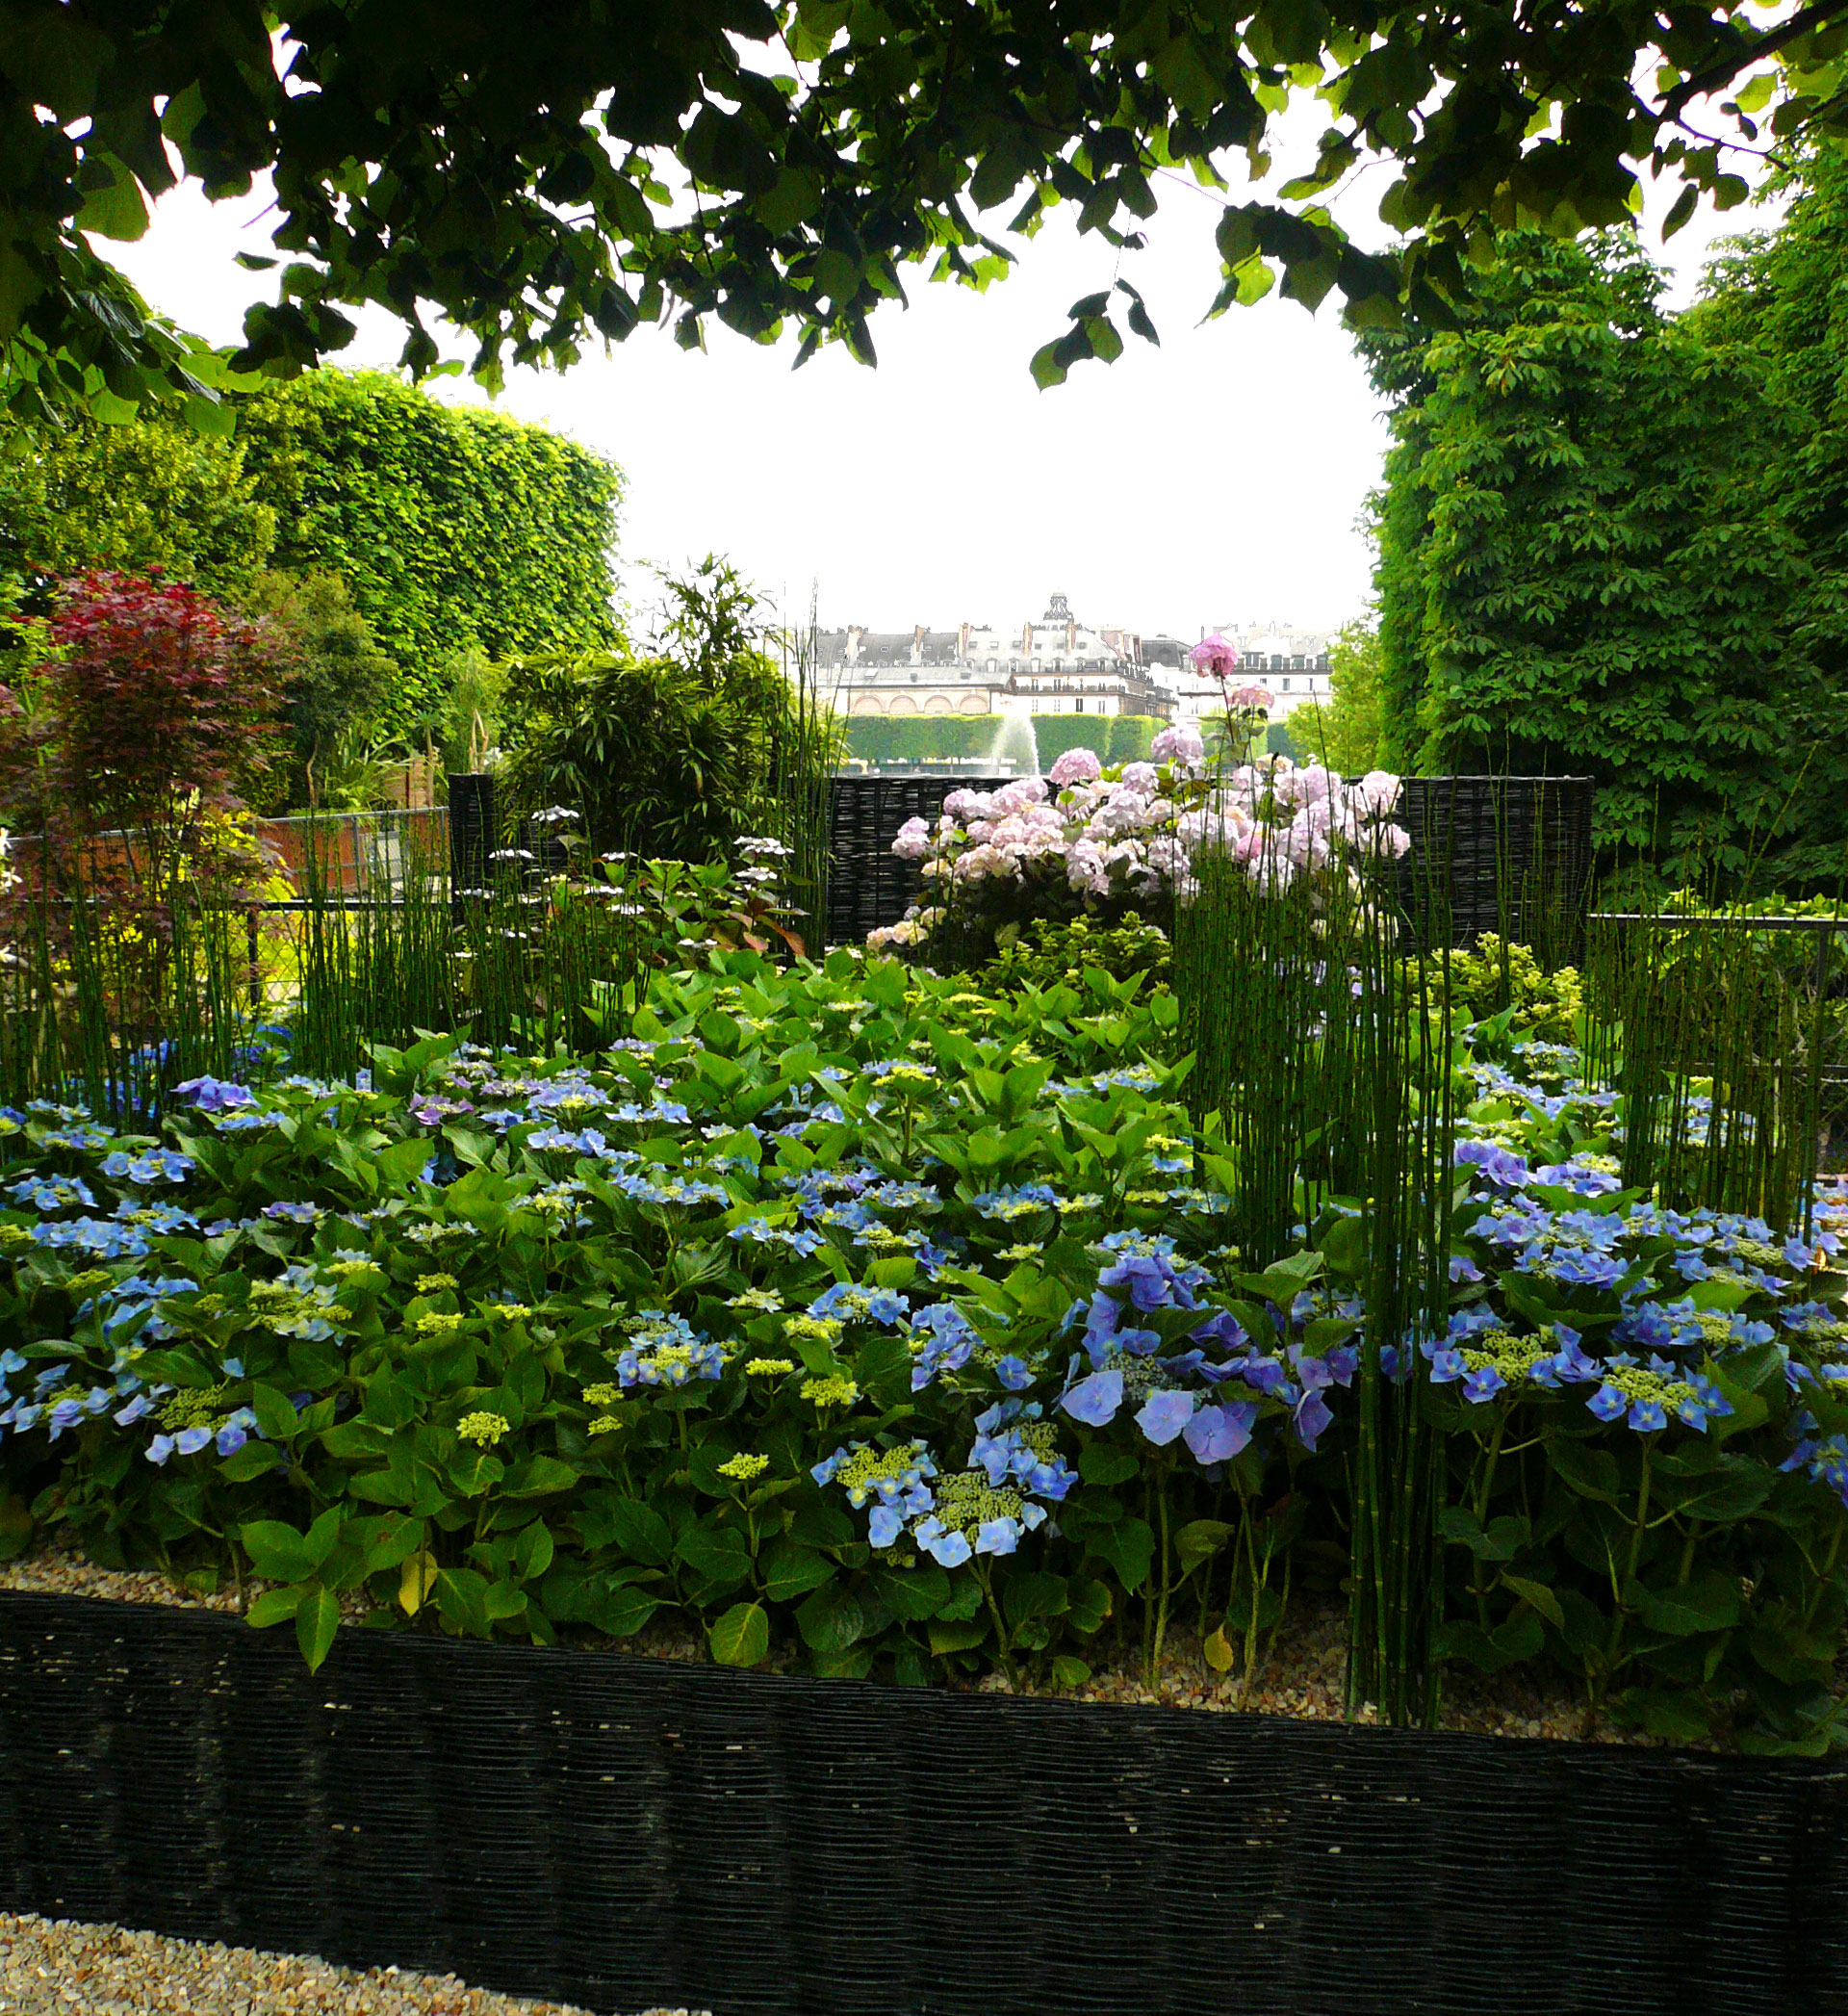 Jardins_Jardin_Jardin_des_Tuileries_Paris_France_Atelier_Jardins_Christian_Préaud_02